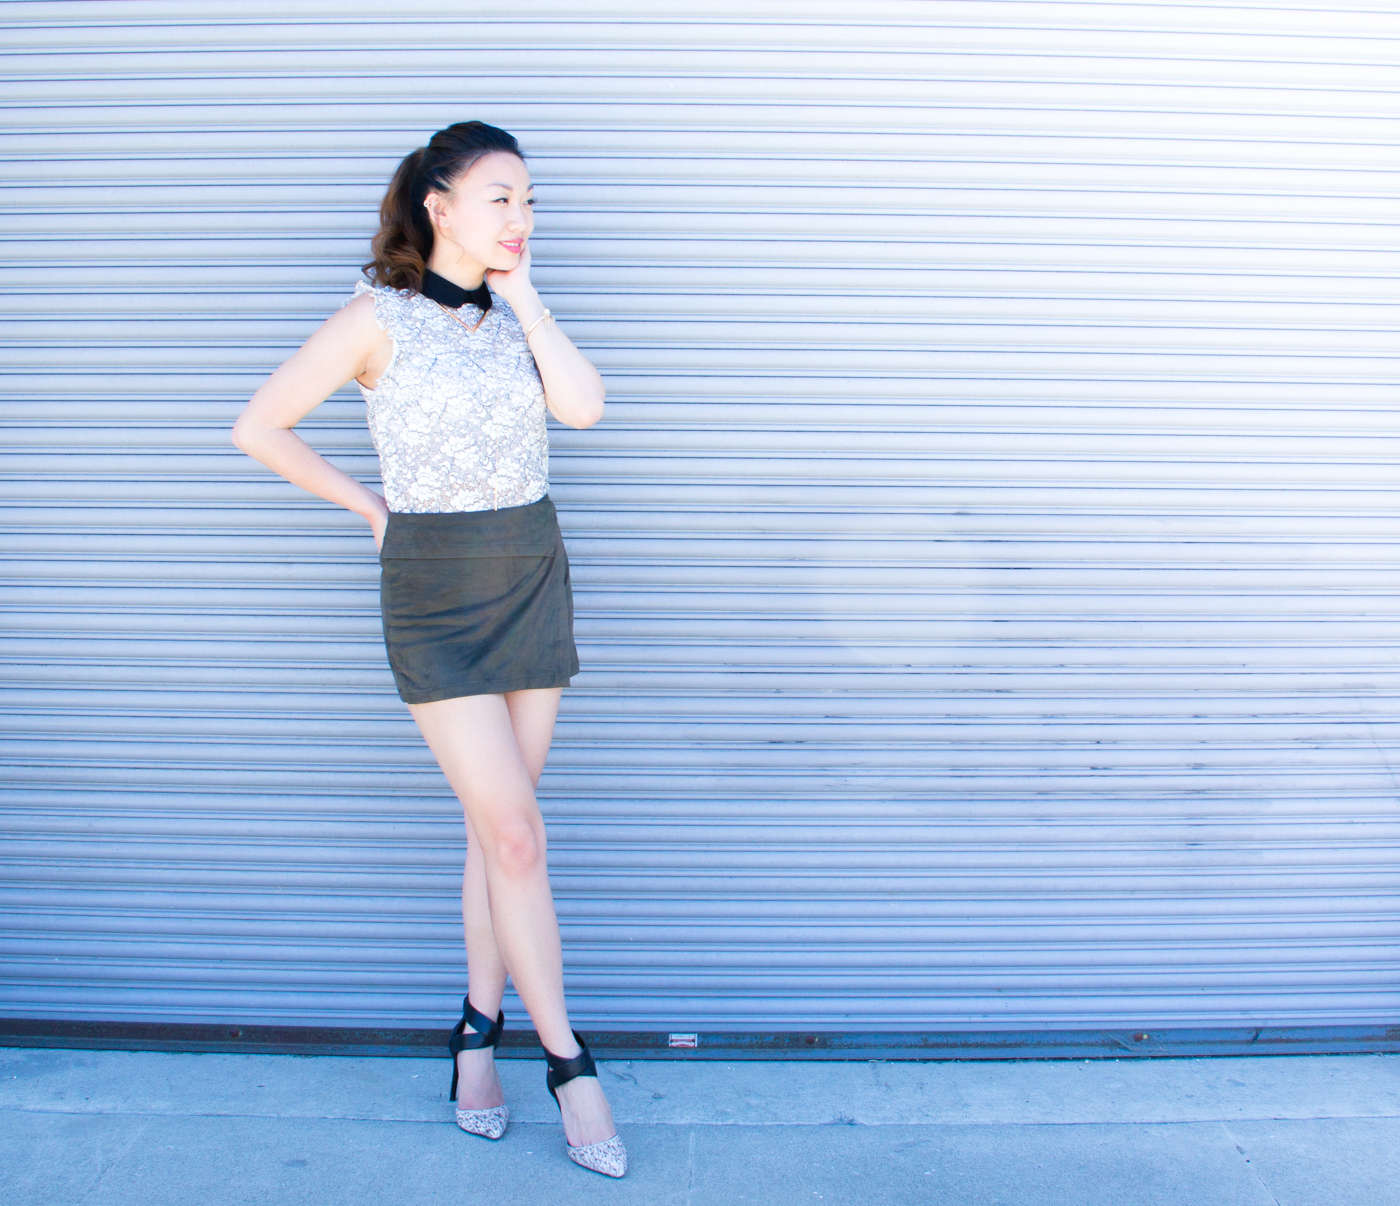 Zara lace top & Enzo Anglioni heels | via The Chic Diary